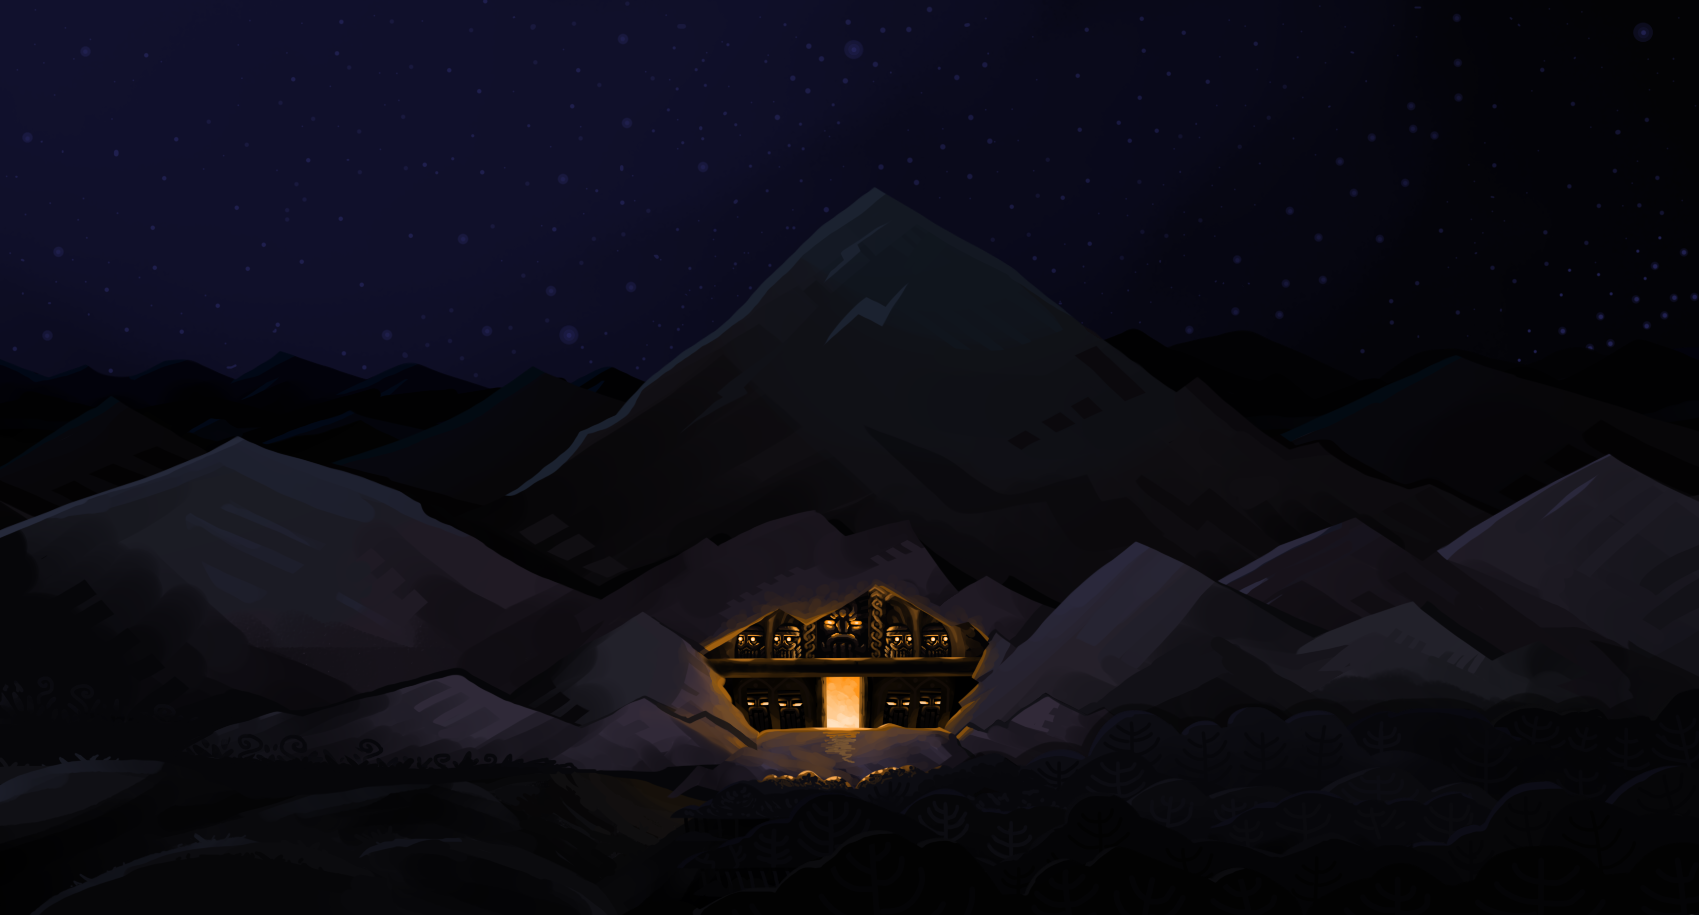 dwarf fortress fanart - Google Search